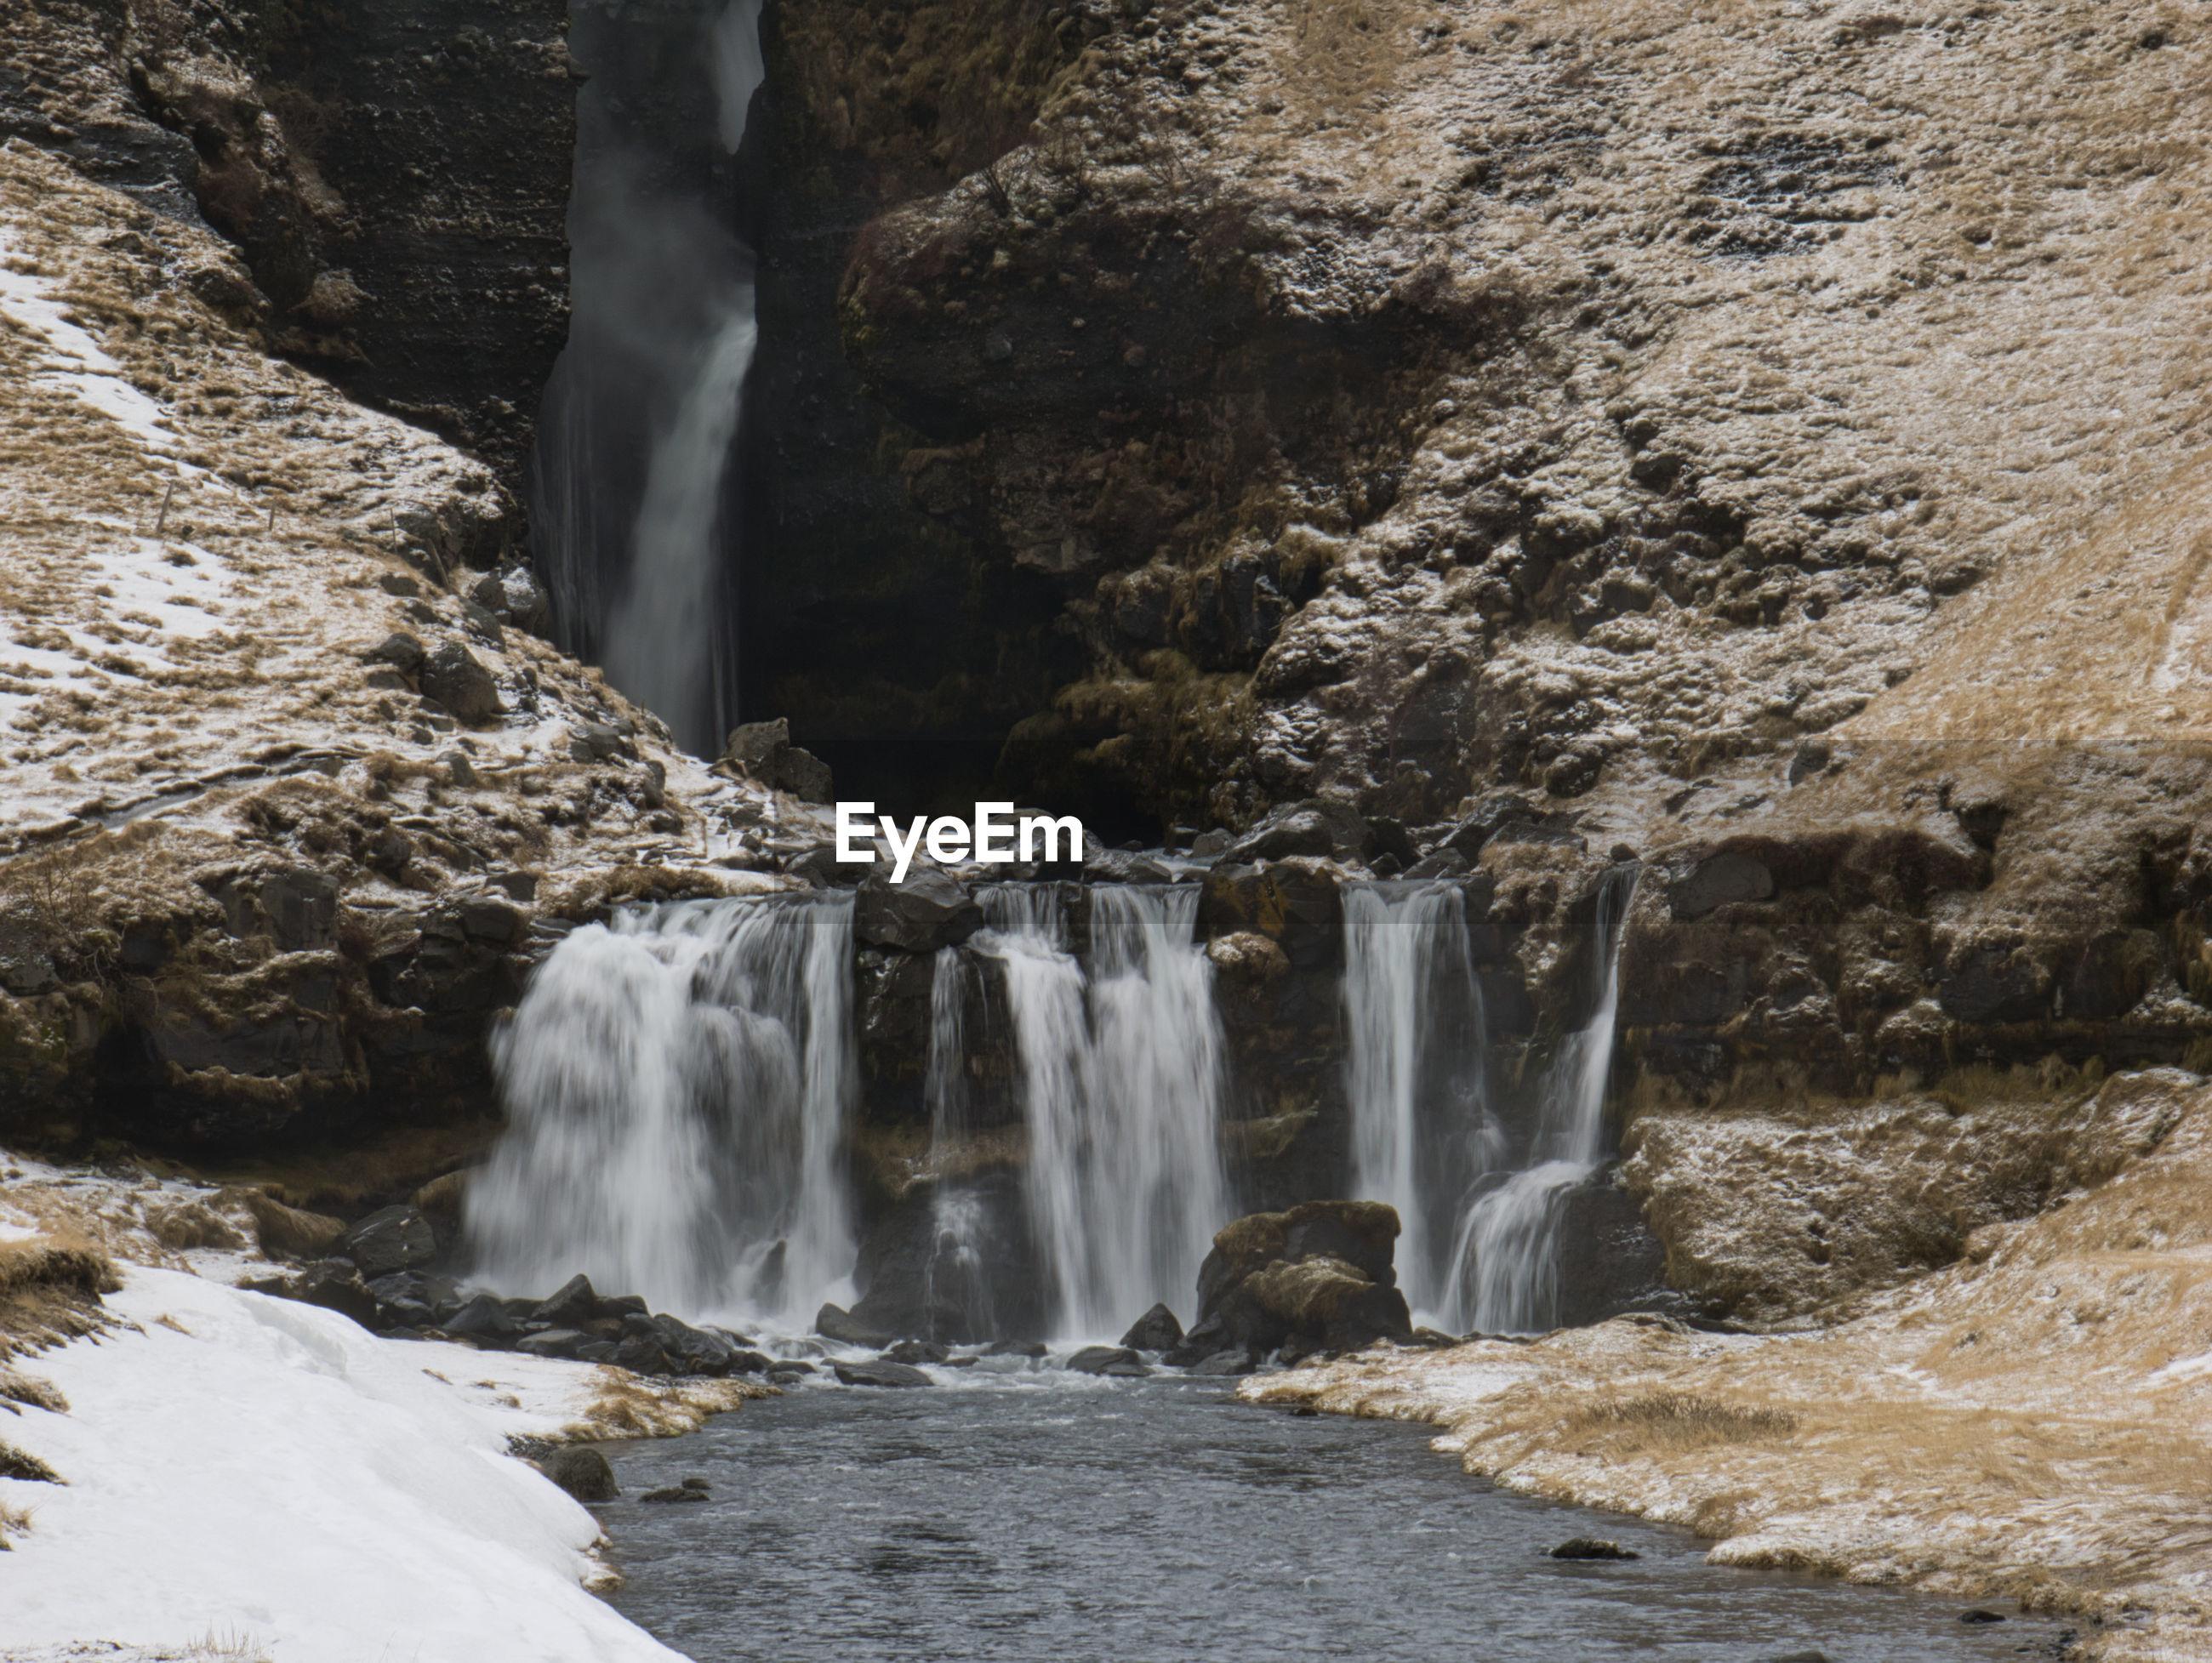 VIEW OF WATERFALL ON ROCKS